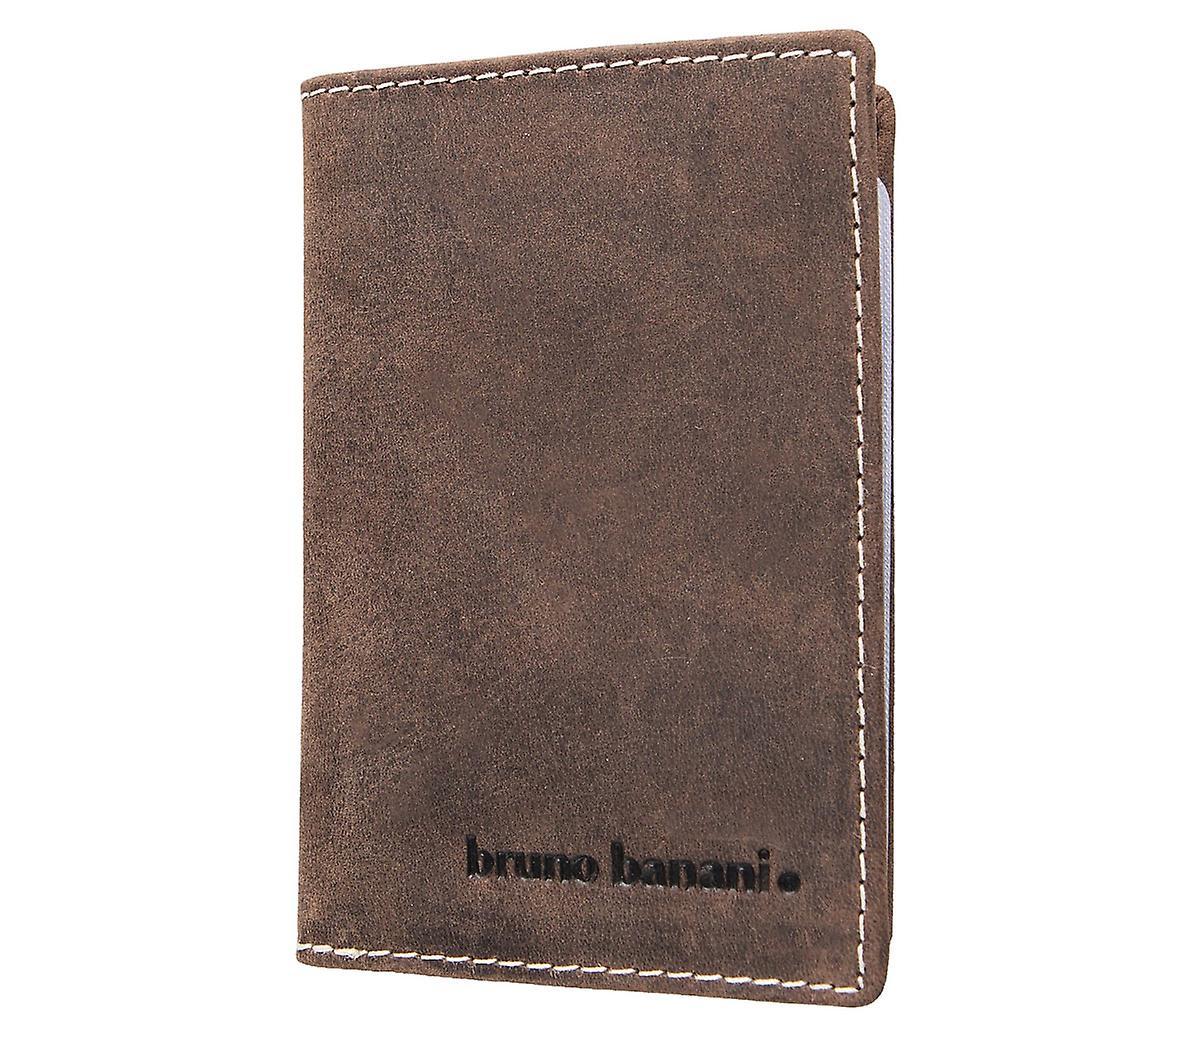 Bruno Banani Kreditkartenetui Kartenetui Visitenkartenetui Leder D Braun 1246